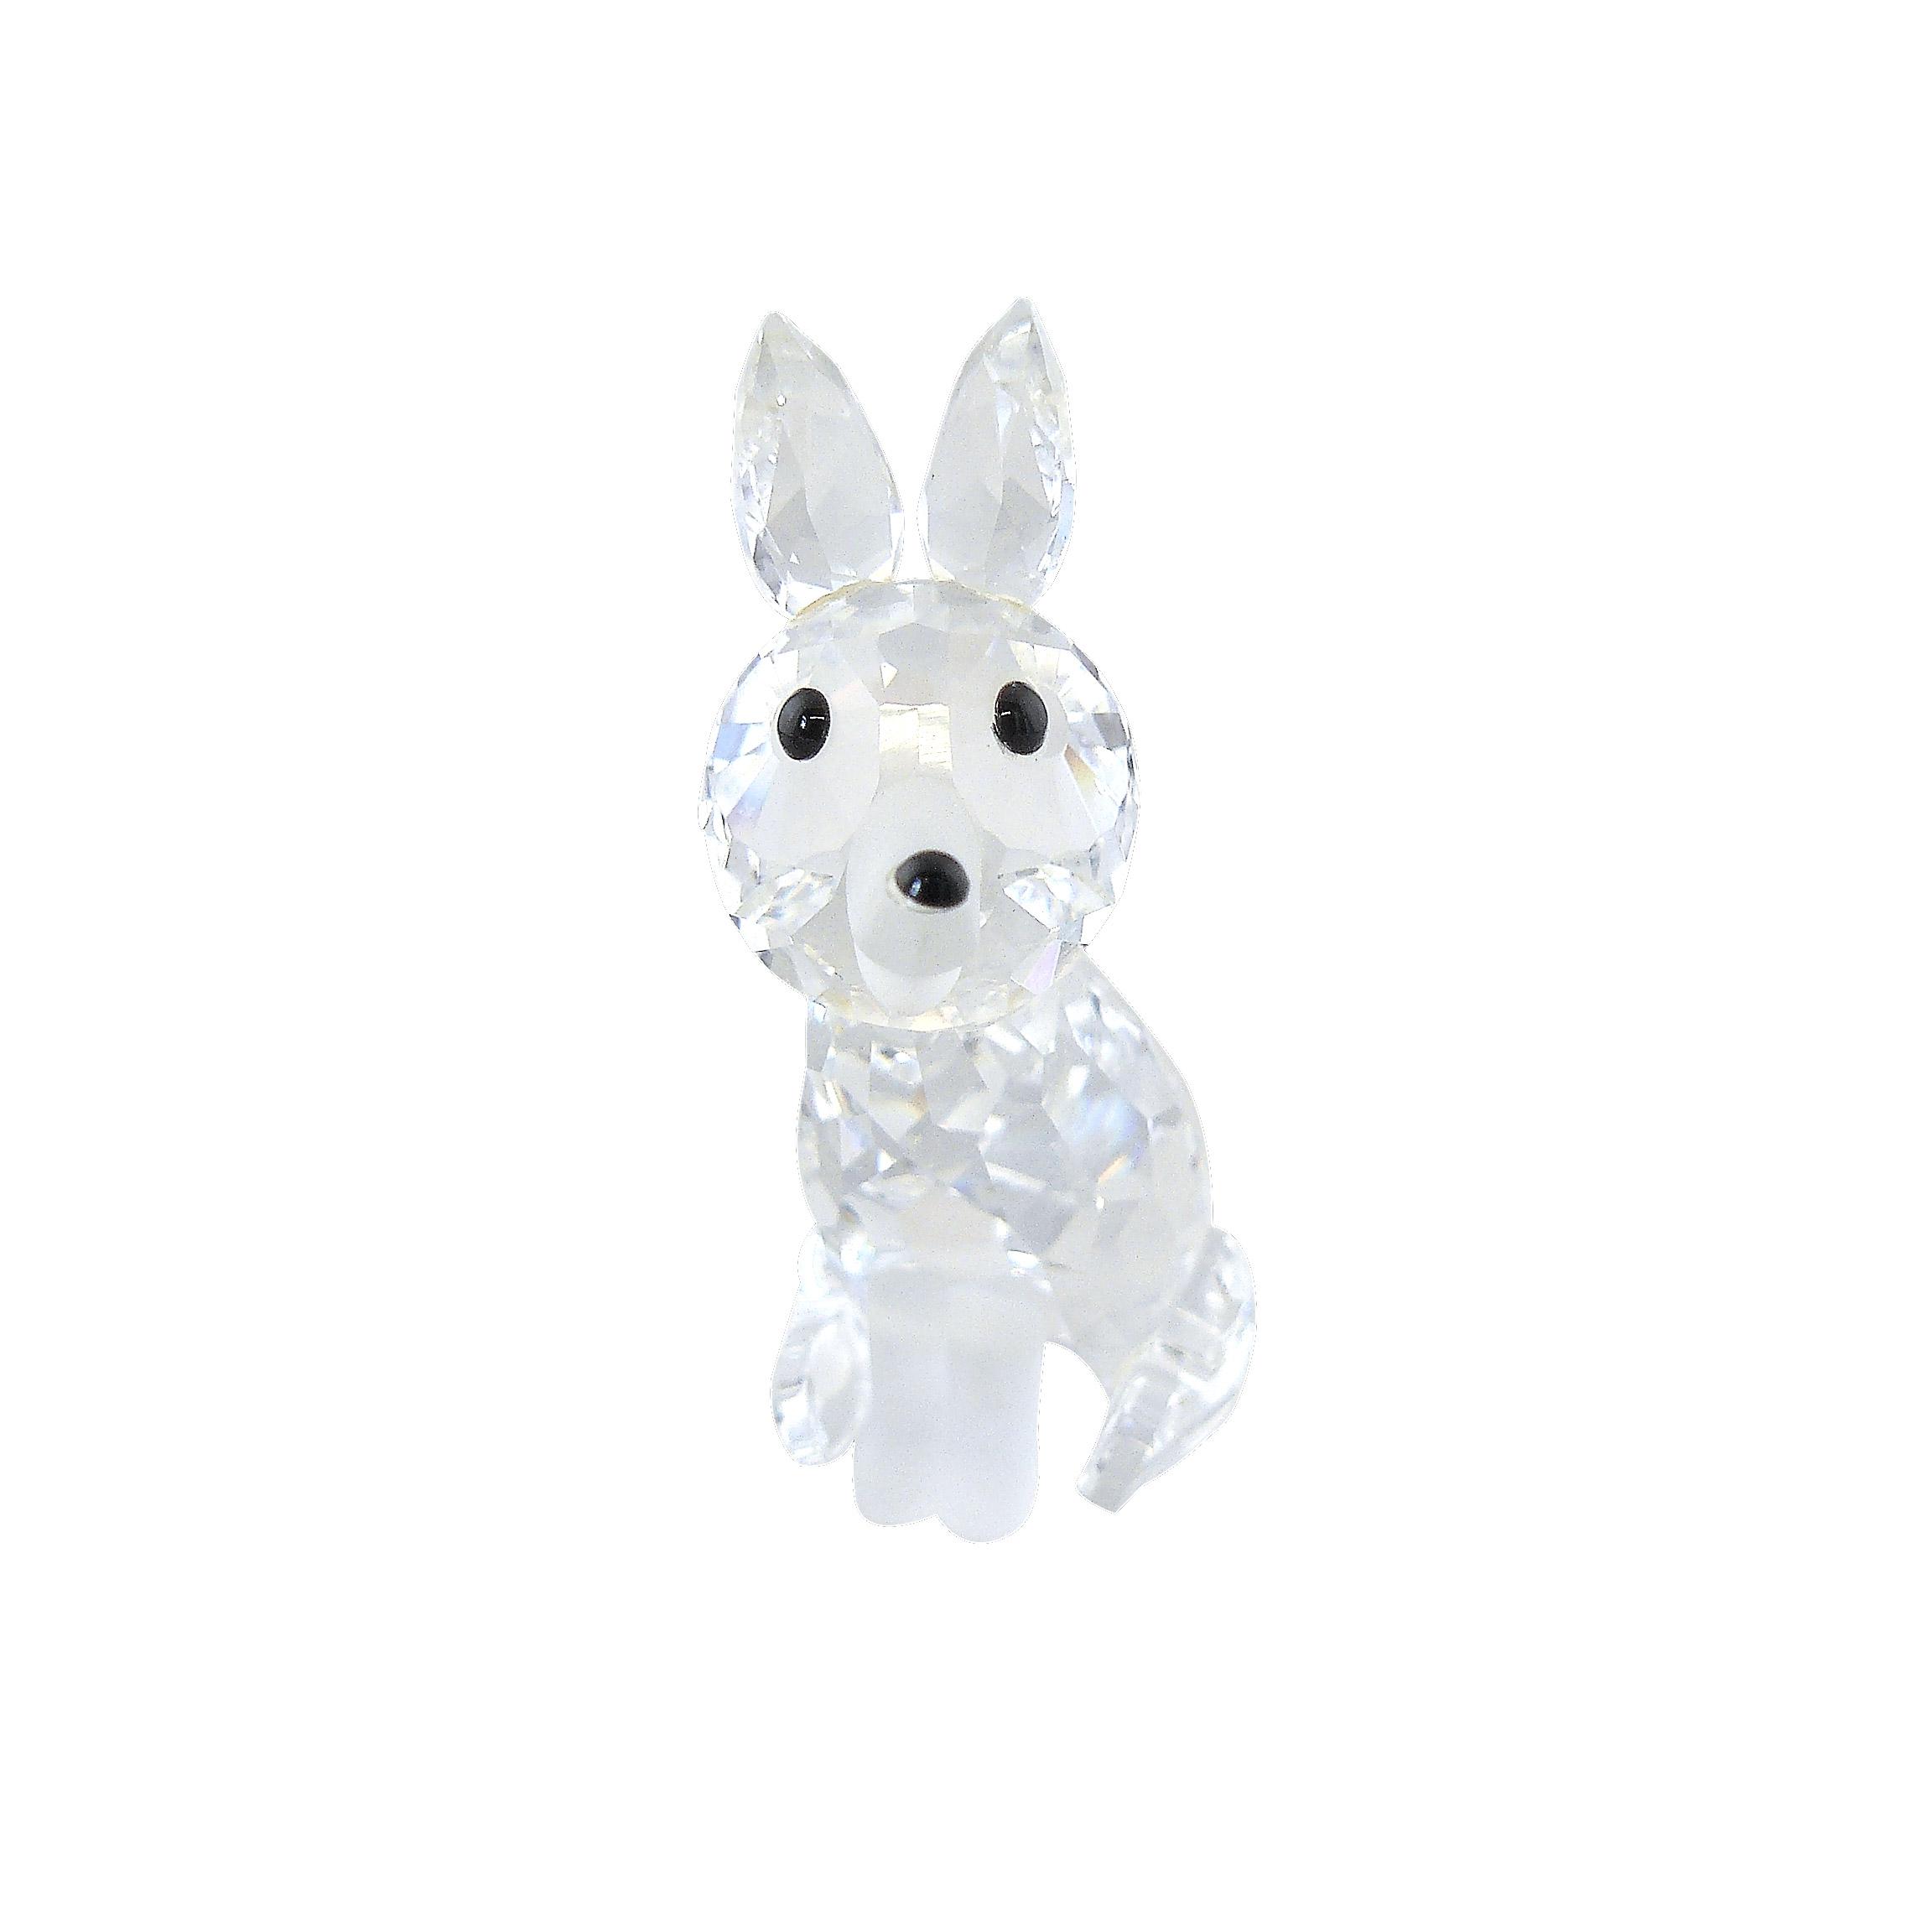 Swarovski Crystal Διακοσμητικό Αλεπού